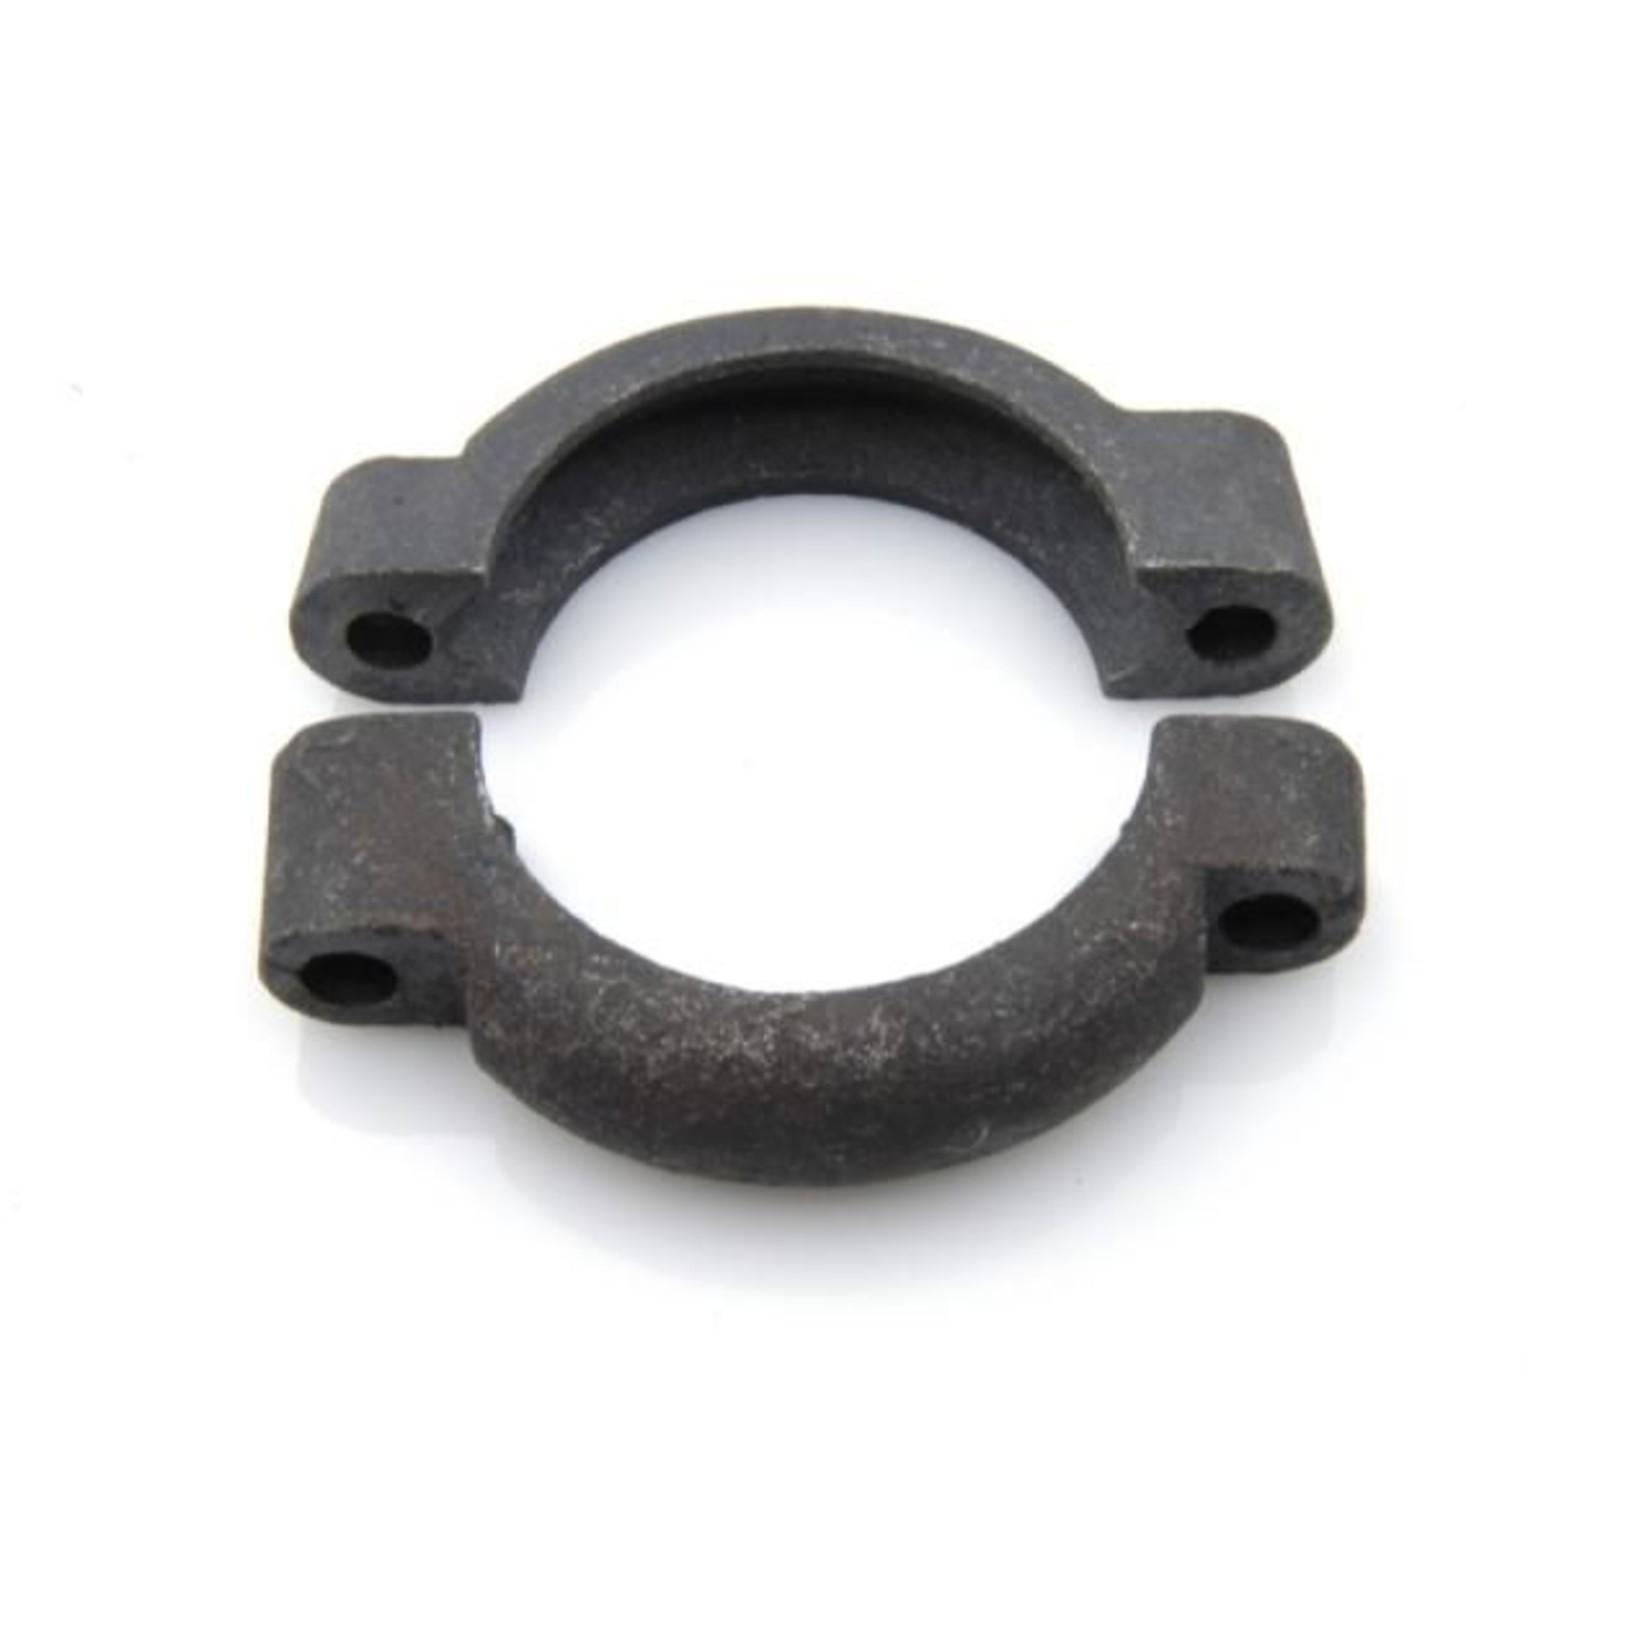 Demi colliers collecteur - tube avanr 66-70 Nr Org: D1826A